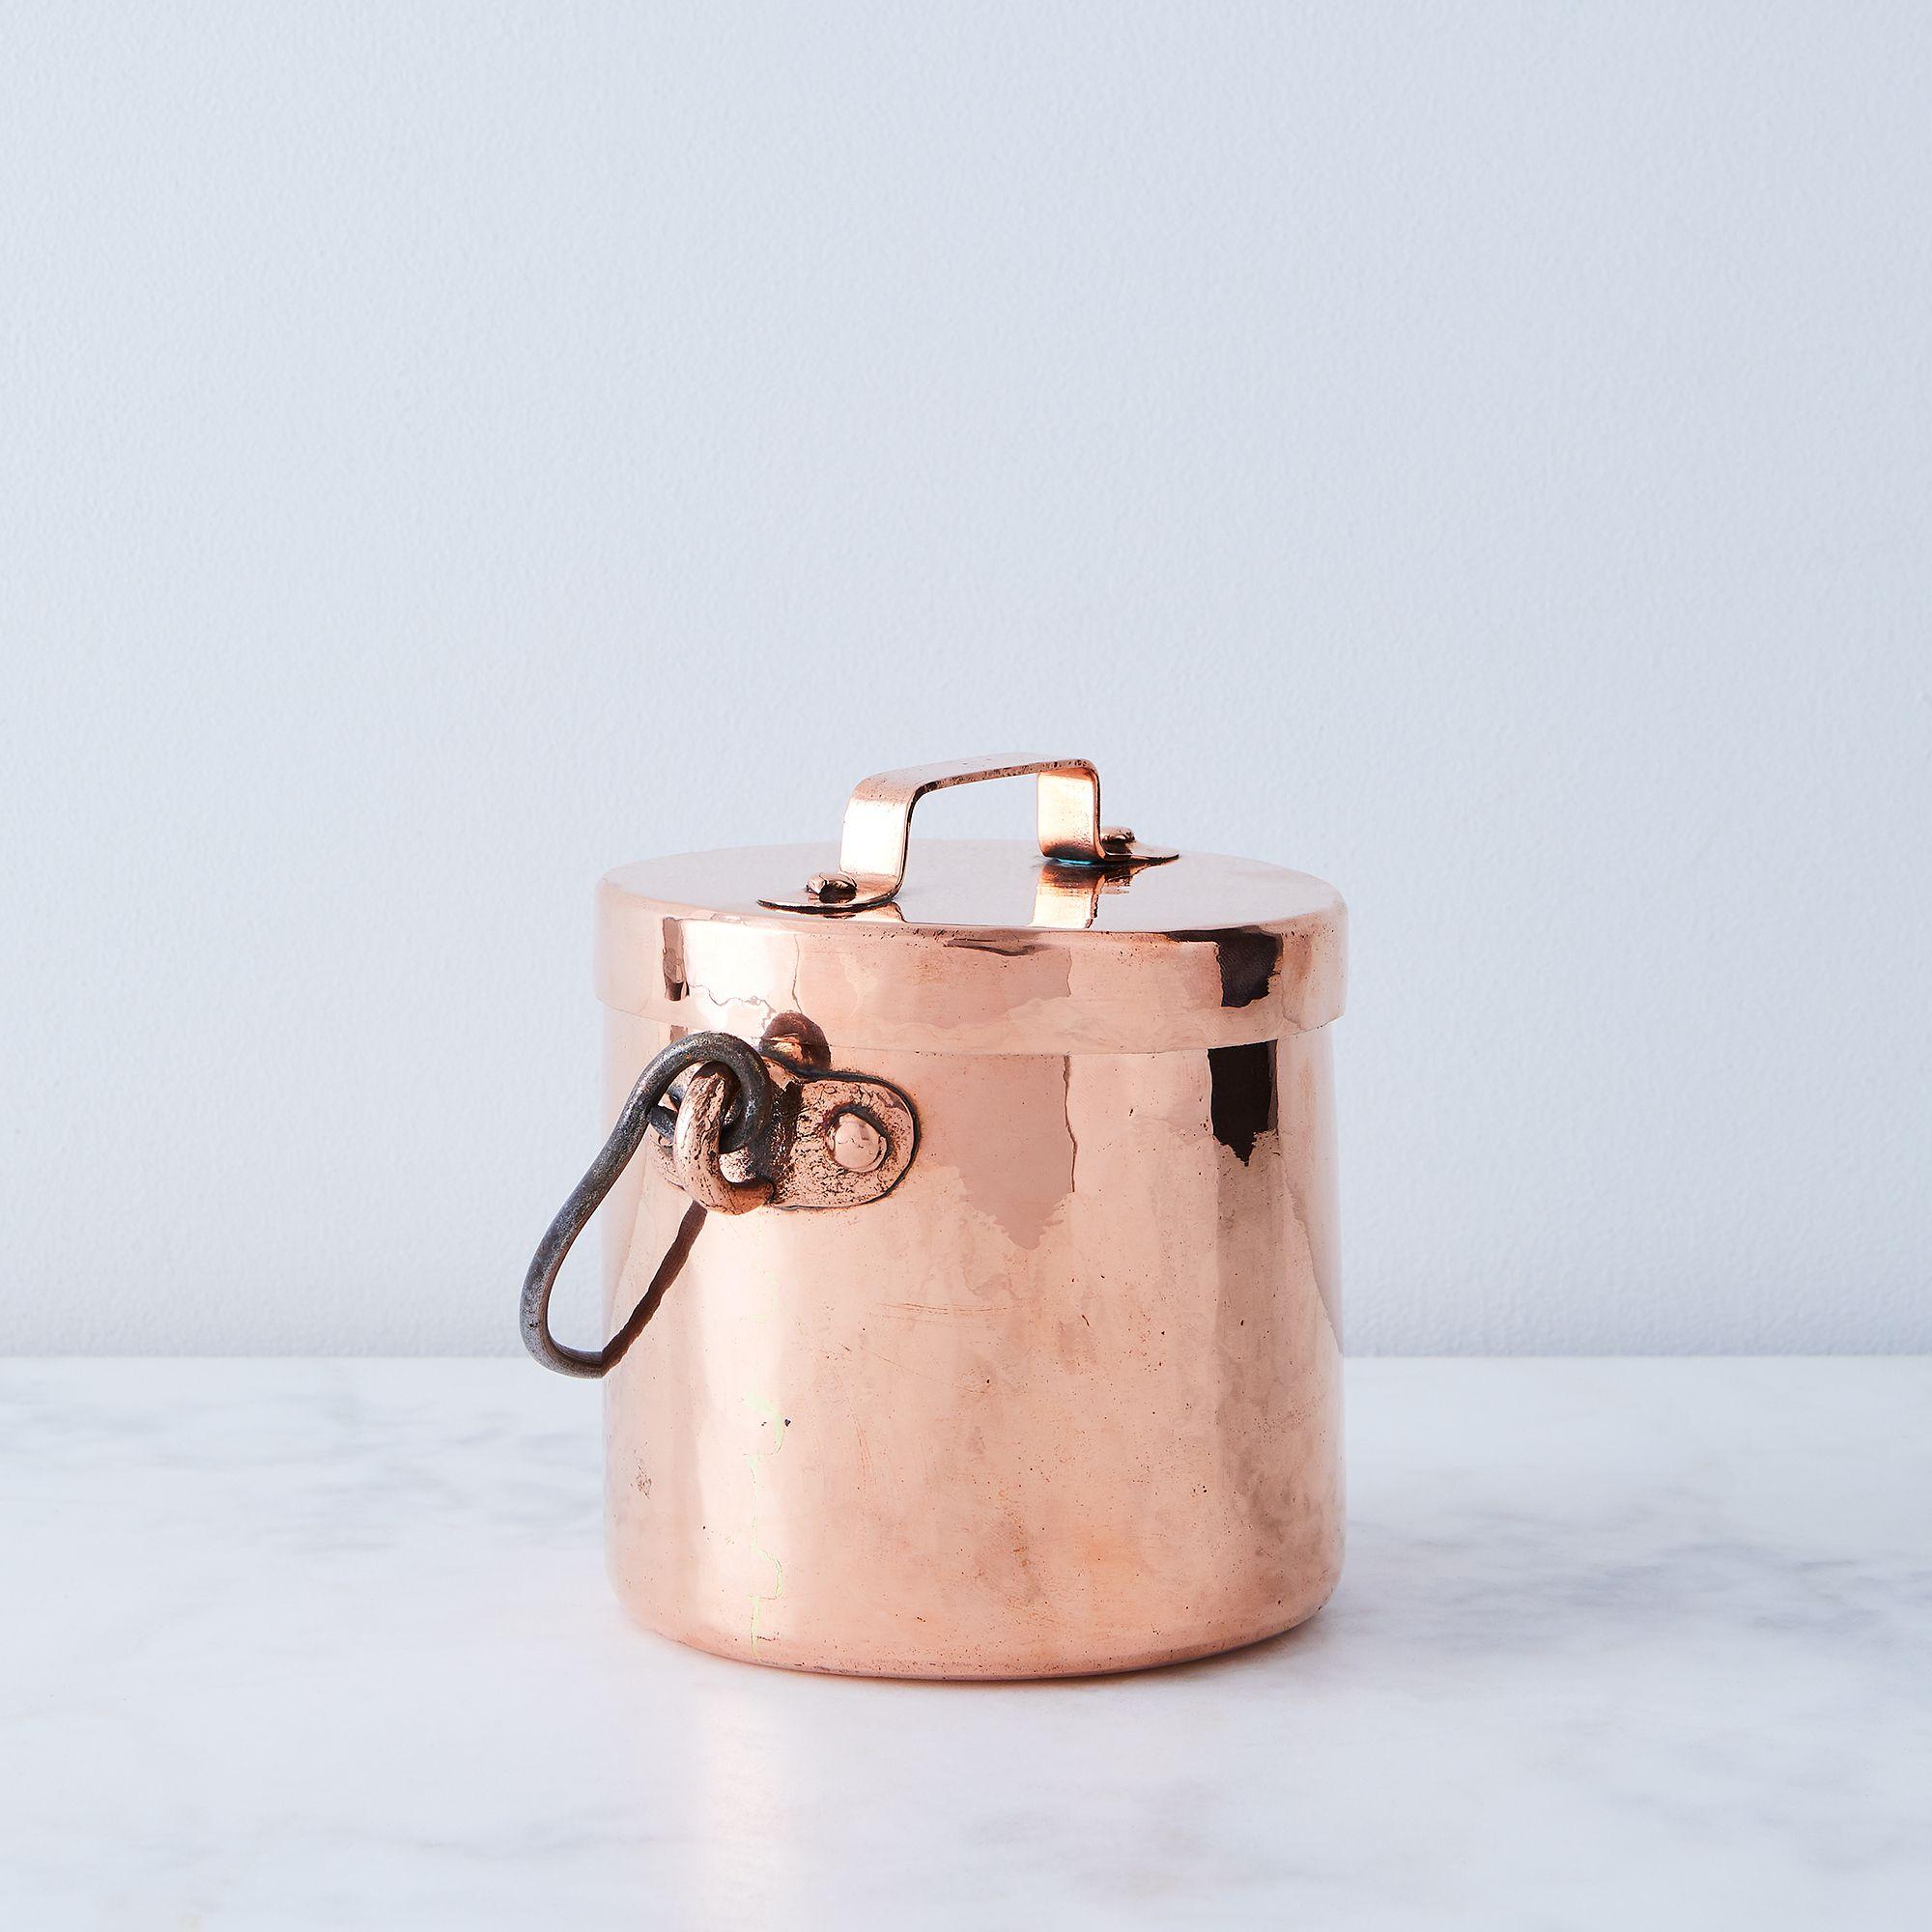 Vintage Copper Petite French Marmite Pot, Mid 19th Century